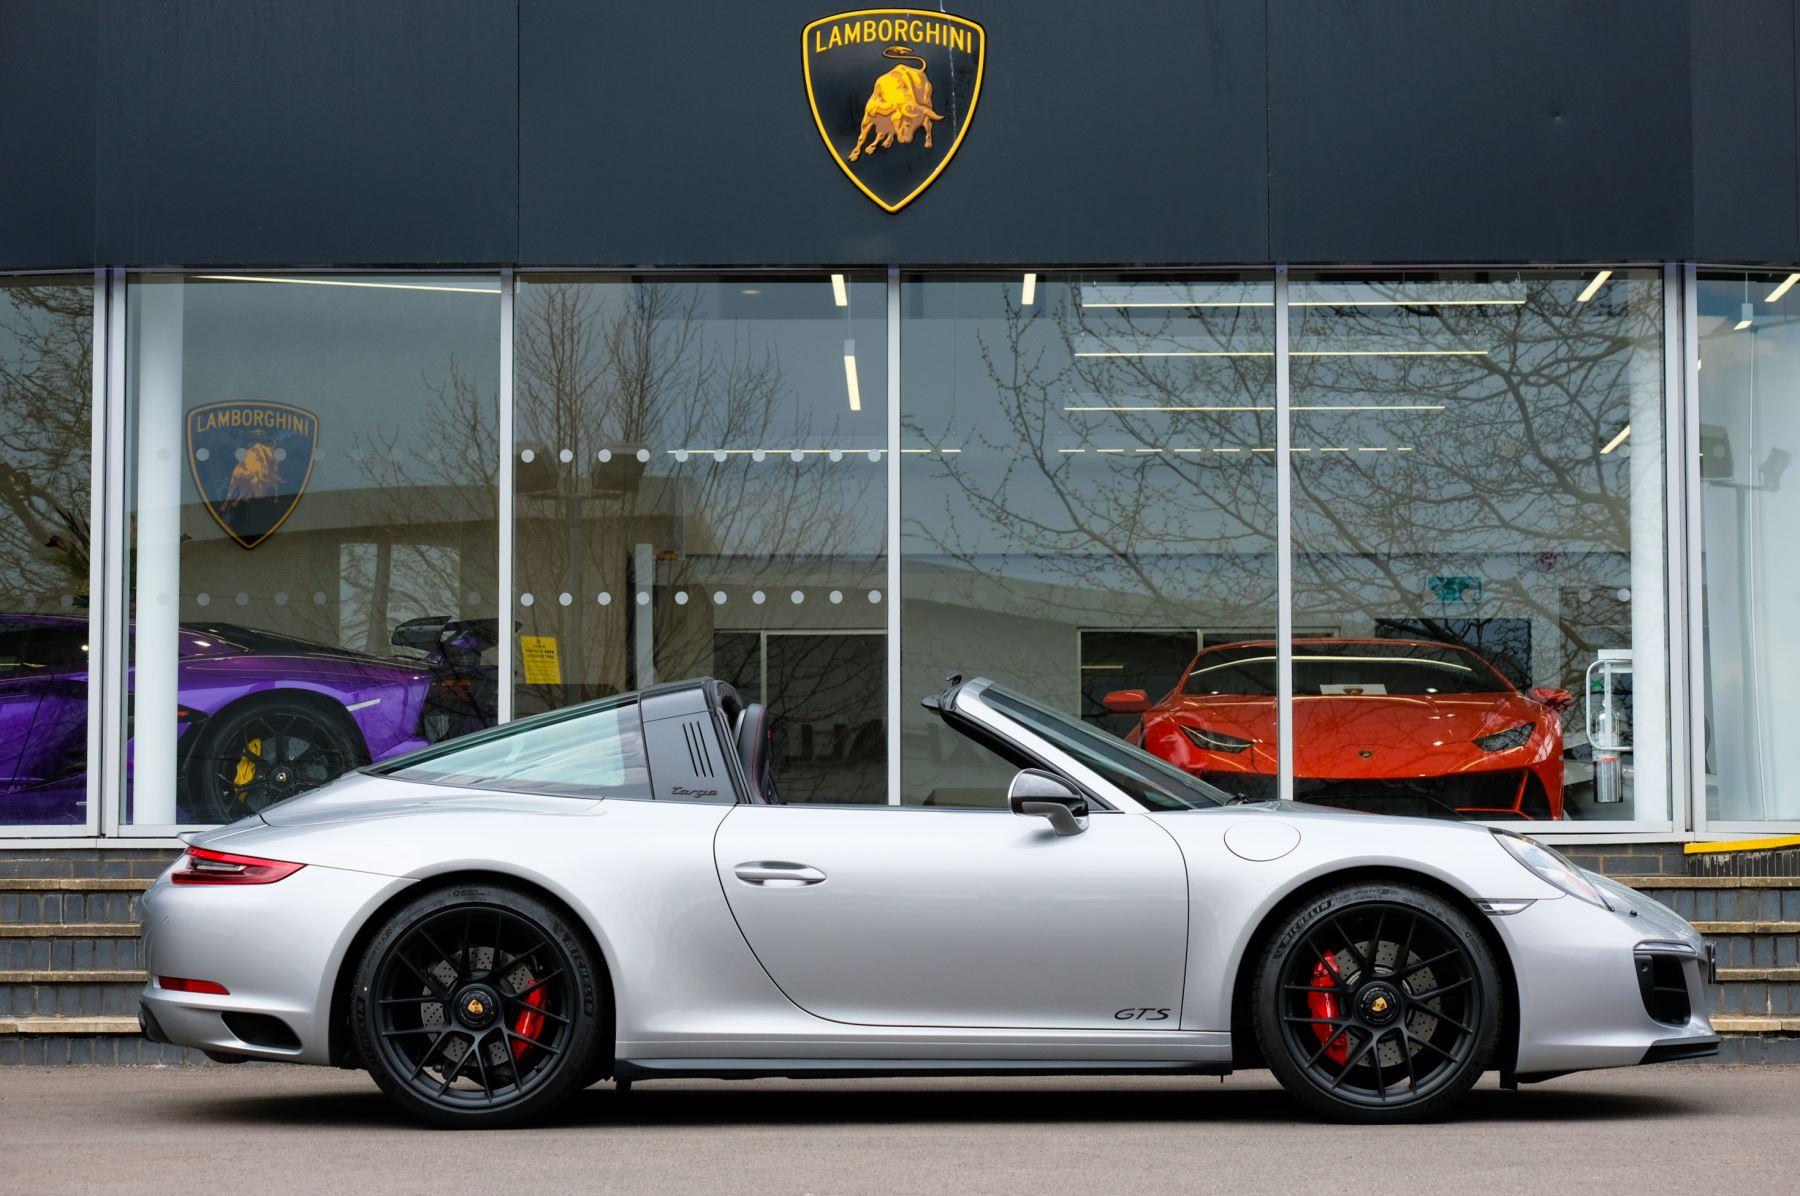 Porsche 911 TARGA 4 GTS - PDK - SPORT DESIGN PACKAGE - GTS INTERIOR PACKAGE image 3